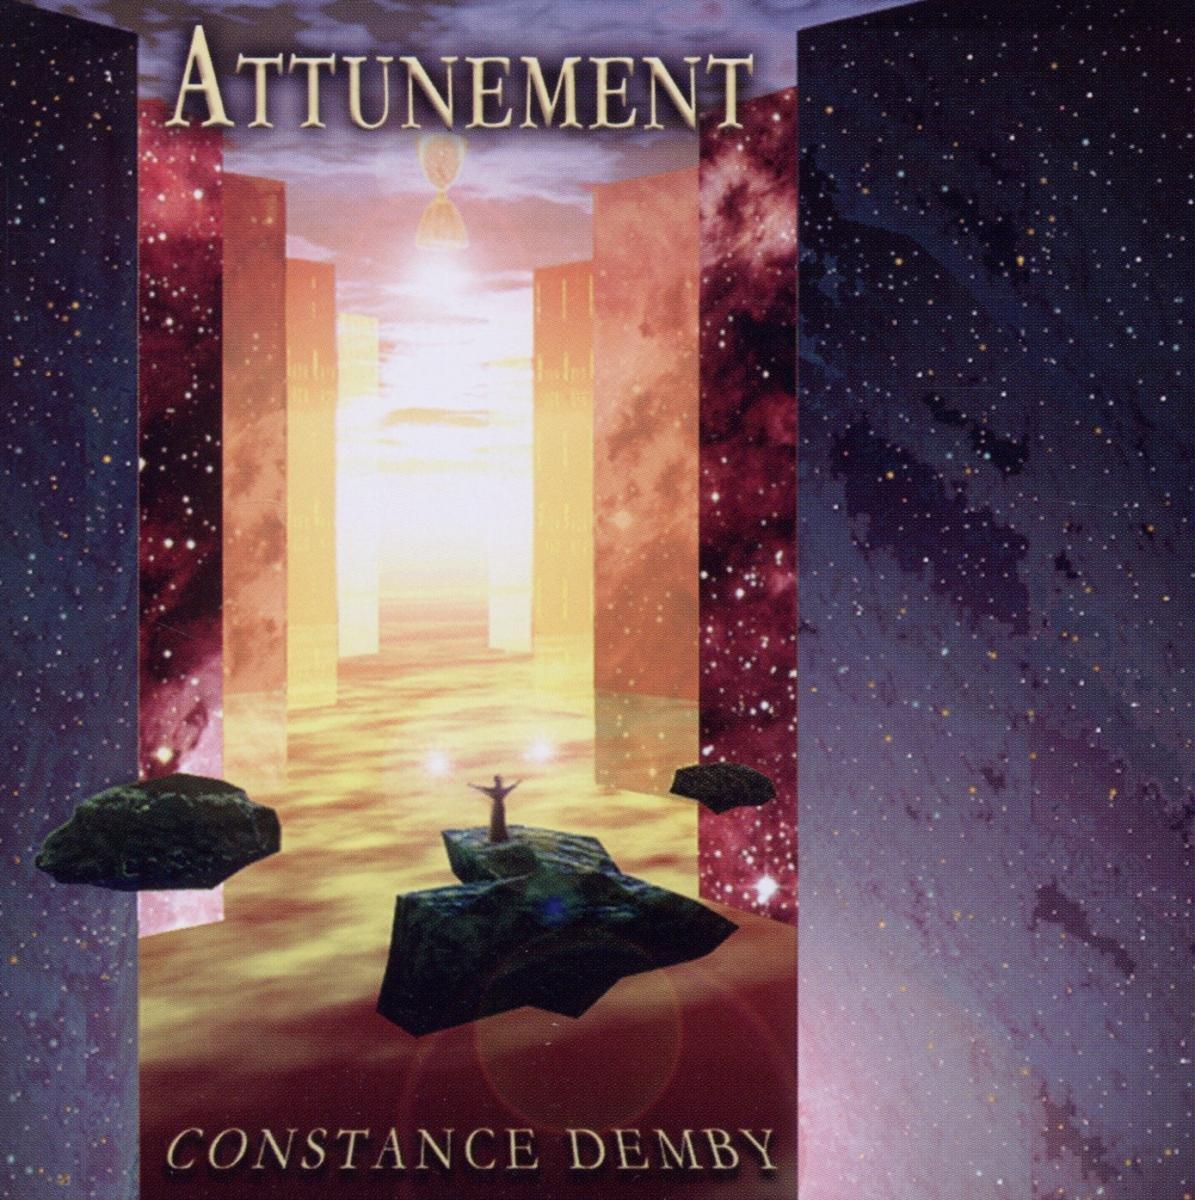 Attunement by CD Baby